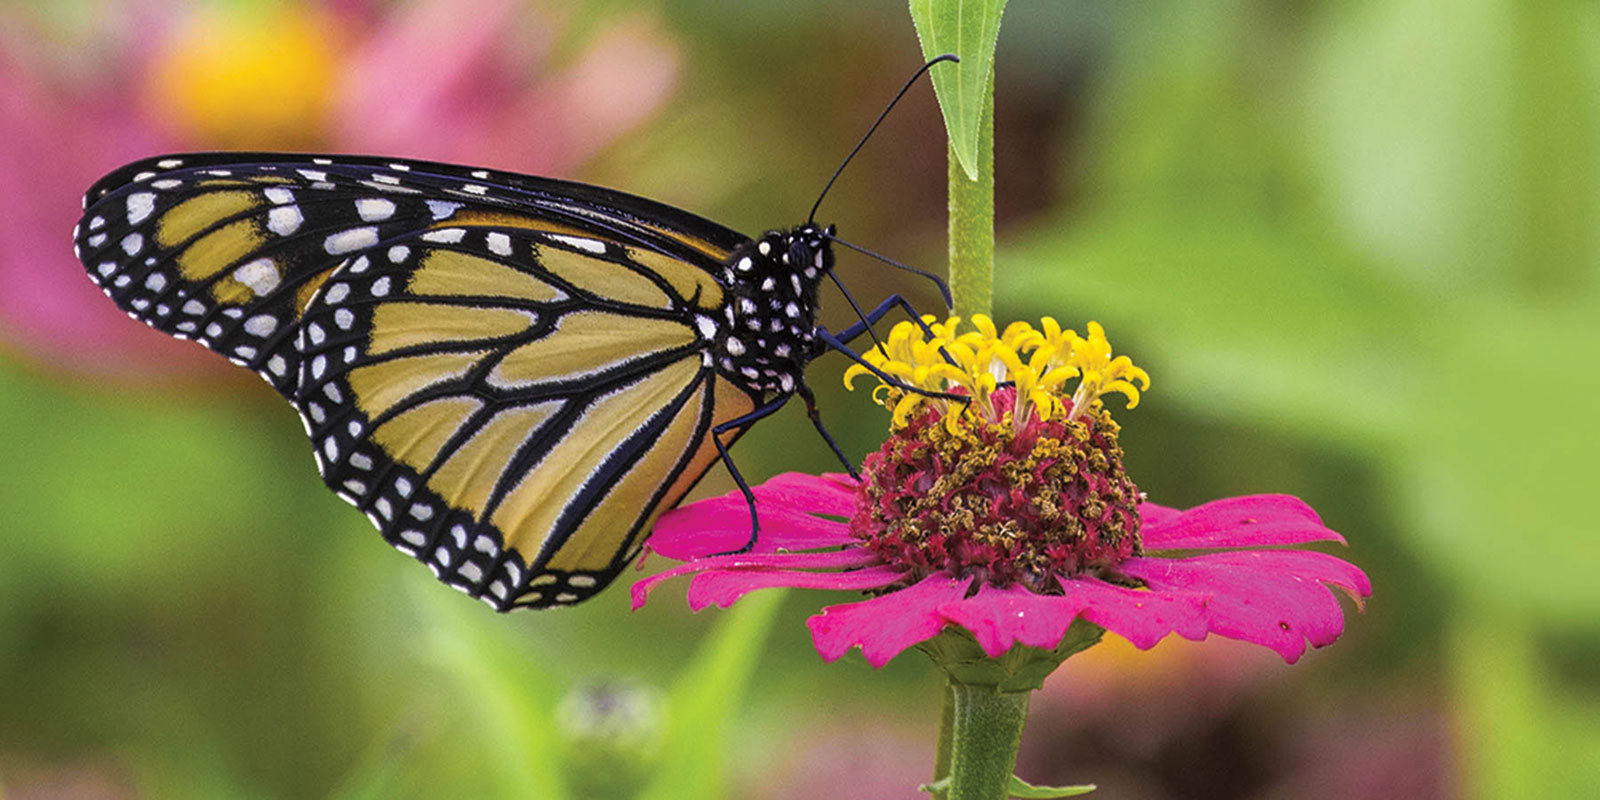 Pollinators are essential for gardens